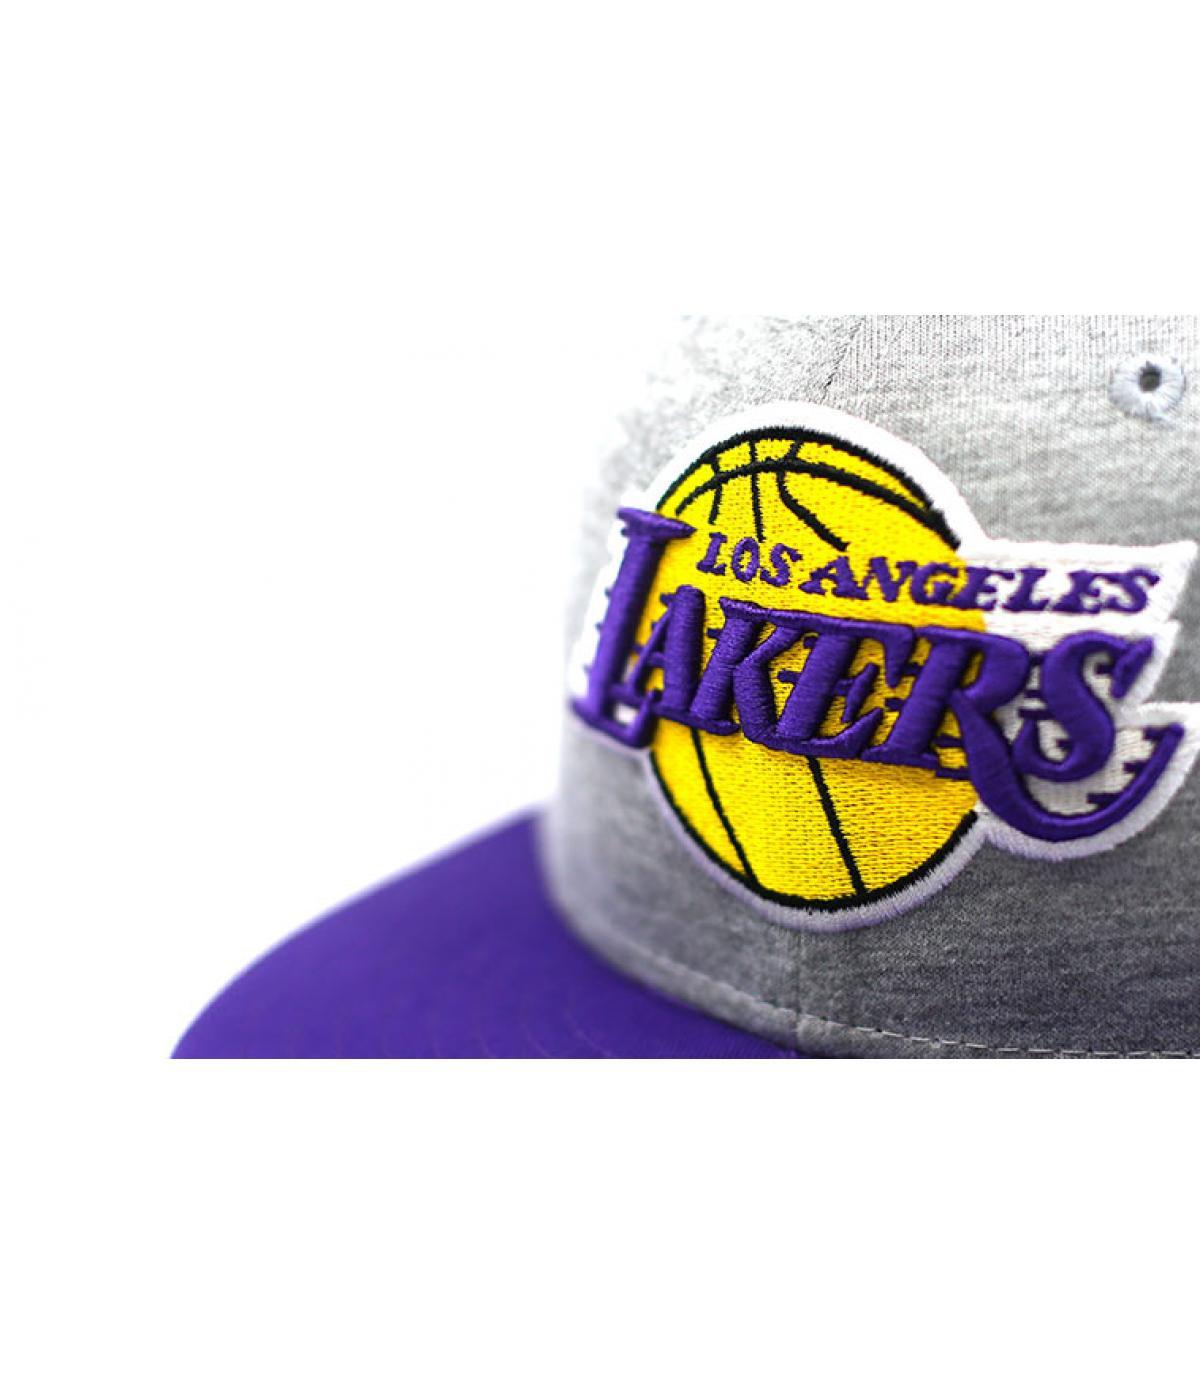 Details Shadow Tech 9Fifty Lakers - Abbildung 3